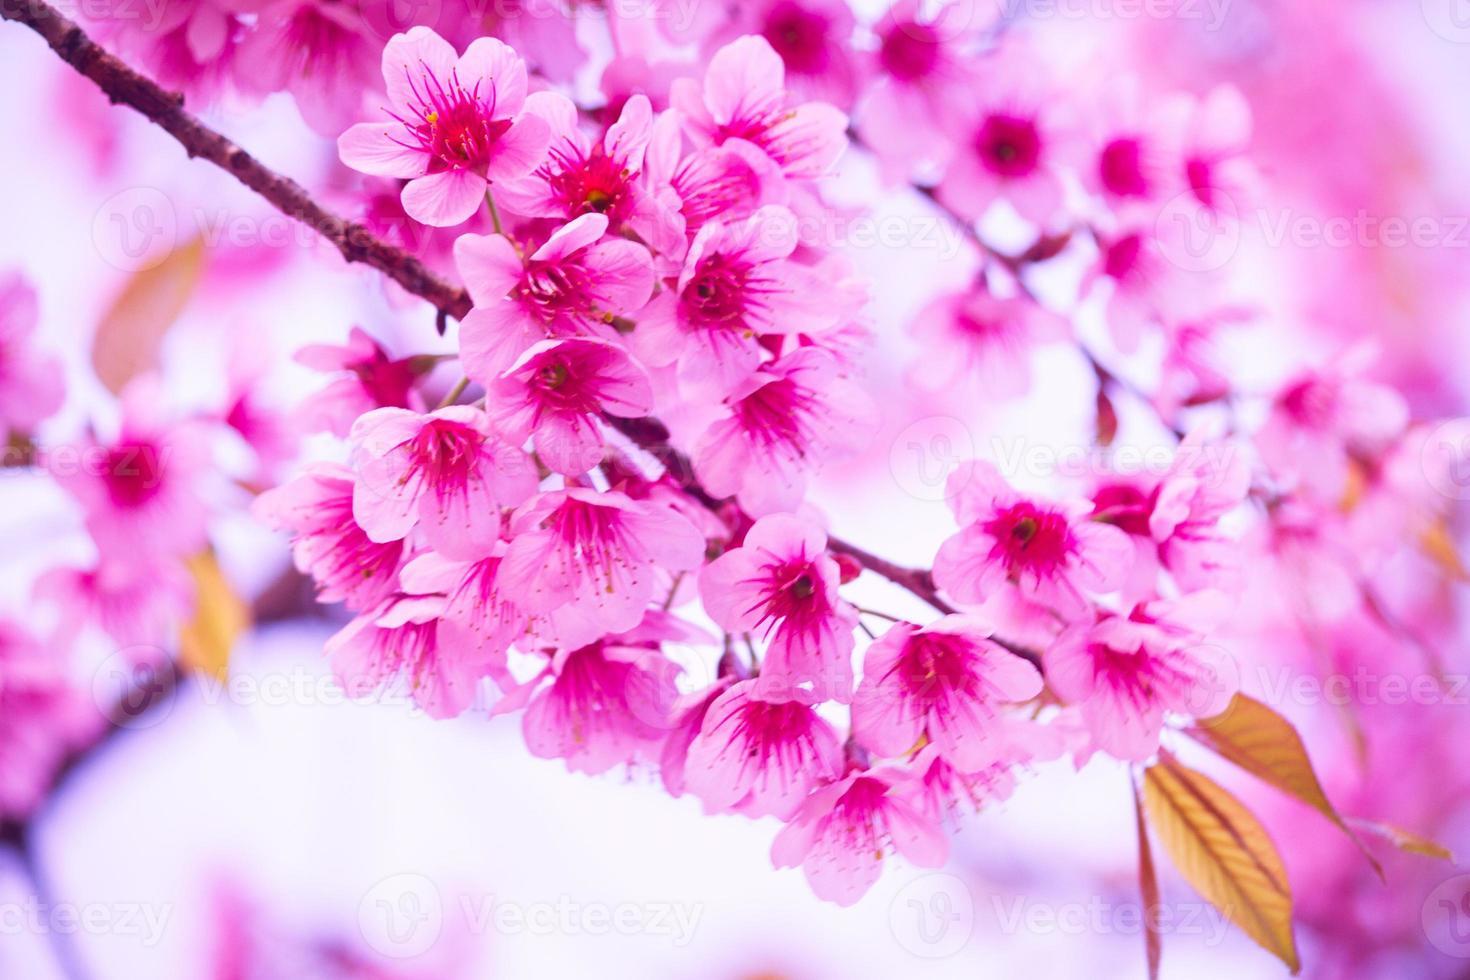 flores de sakura en flor. hermosa flor de cerezo rosa foto